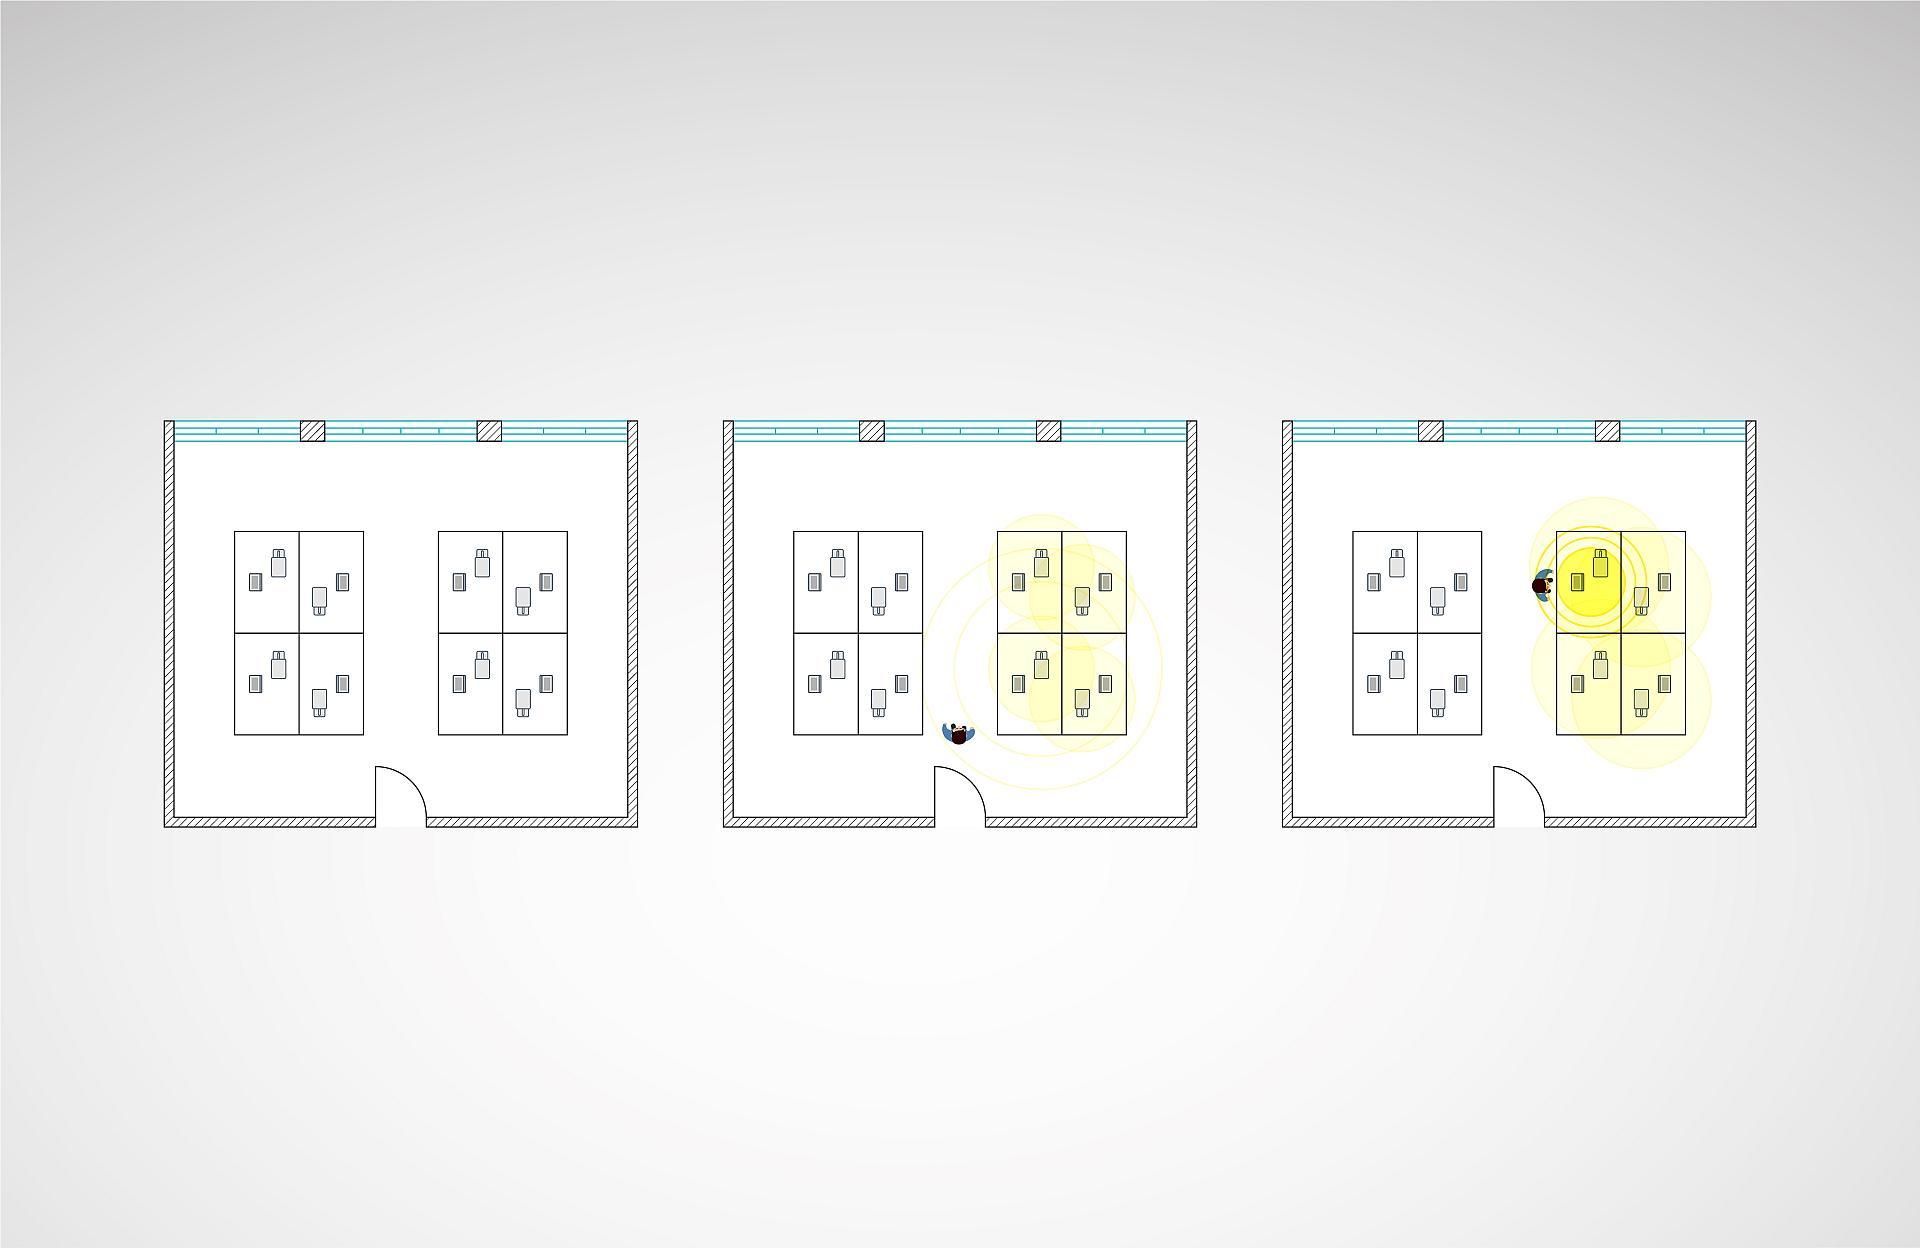 Strange Bicult Led Products Trilux Simplify Your Light Wiring Digital Resources Bletukbiperorg